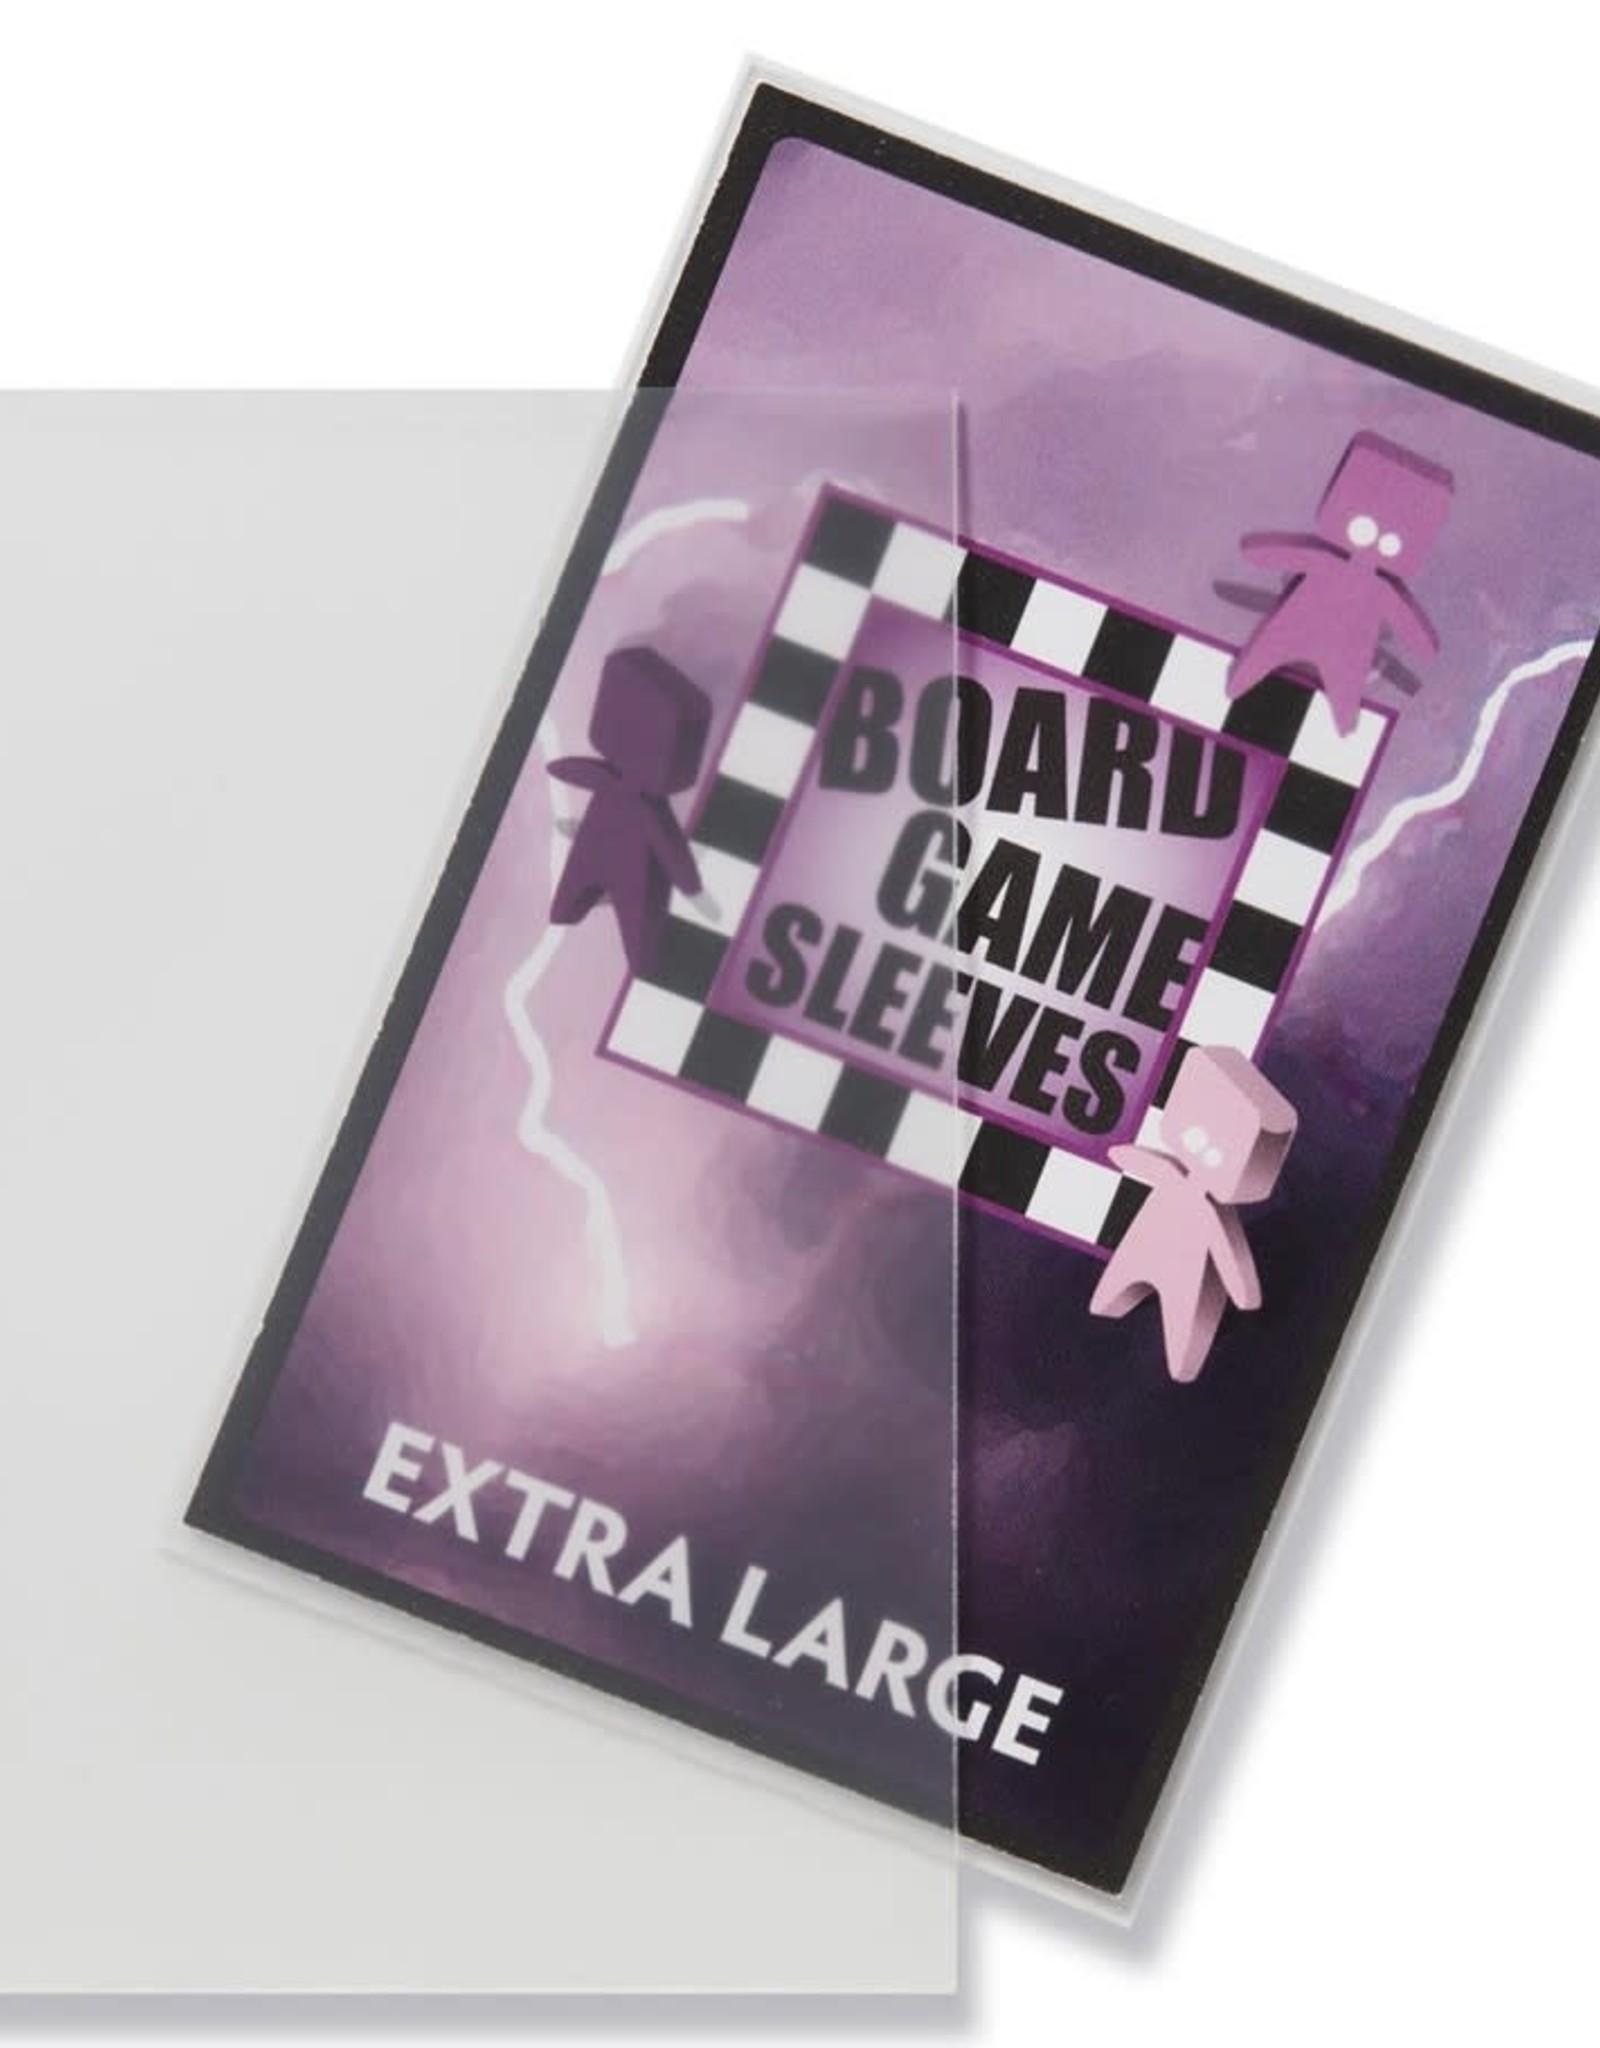 Arcane Tinmen Sleeves: No Glare Extra Large Board Game (50)